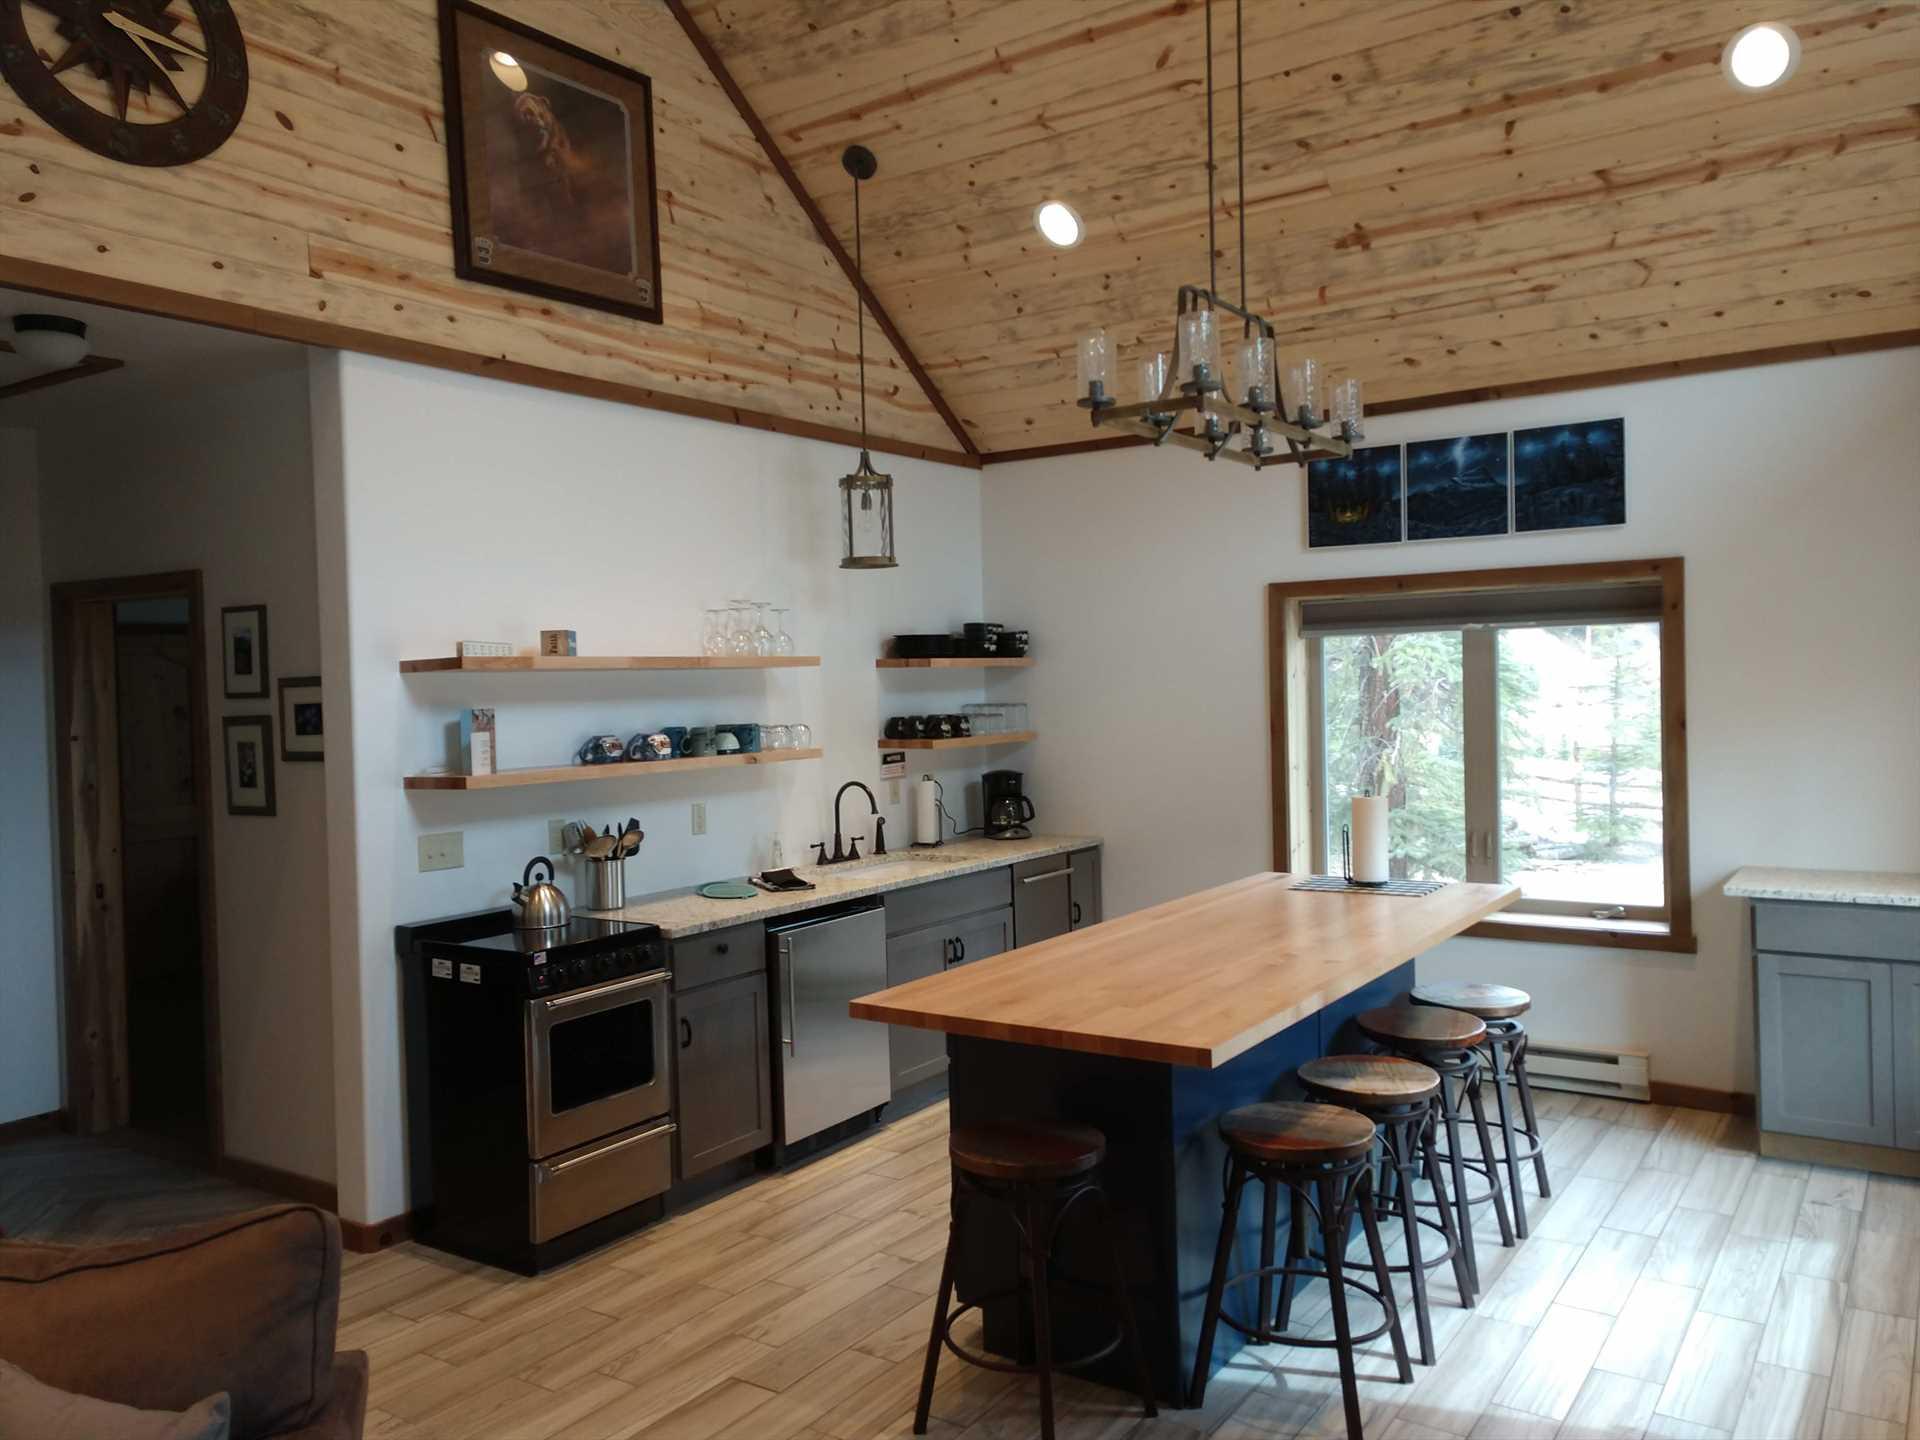 Kitchen in Bunkhouse